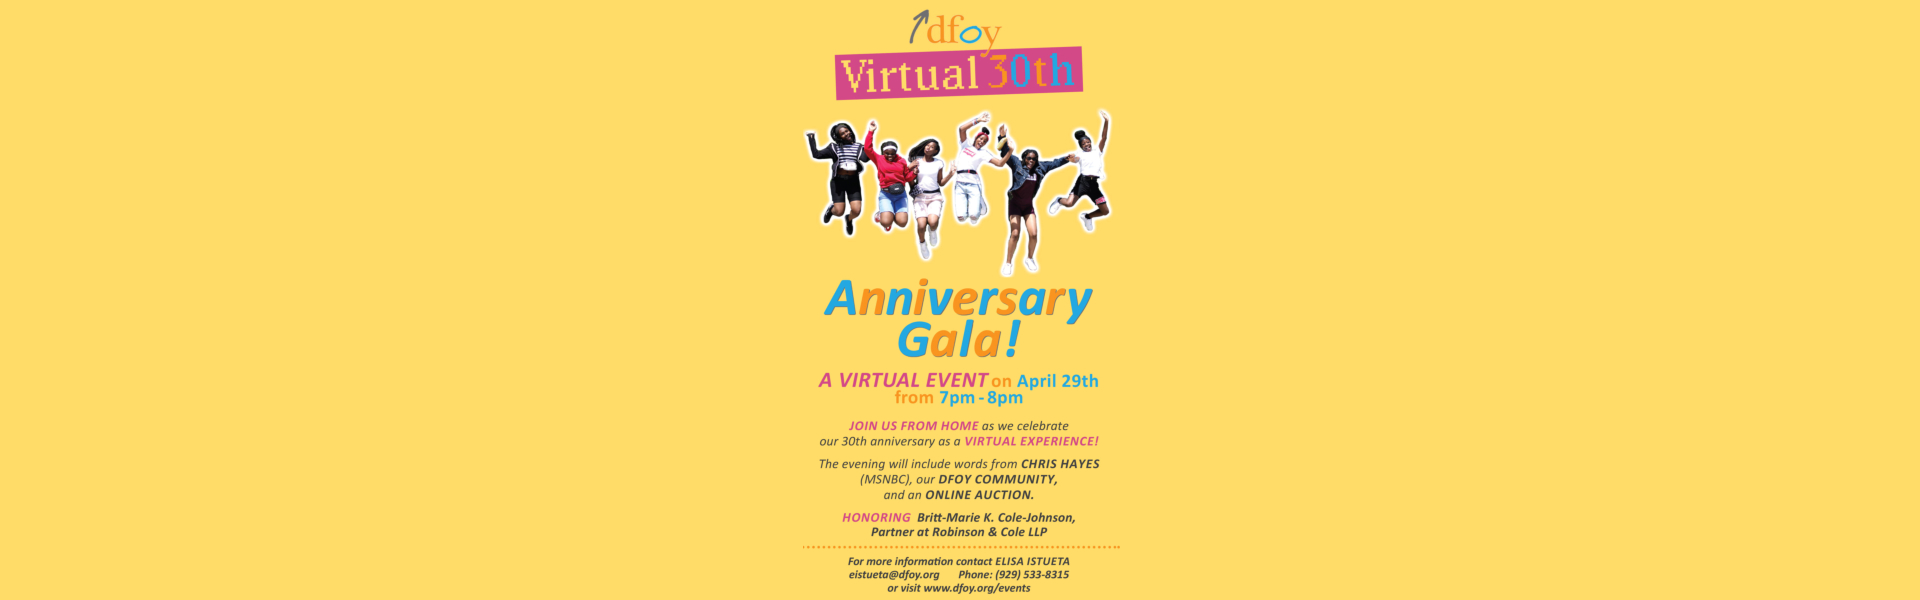 Virtual Anniversary Gala